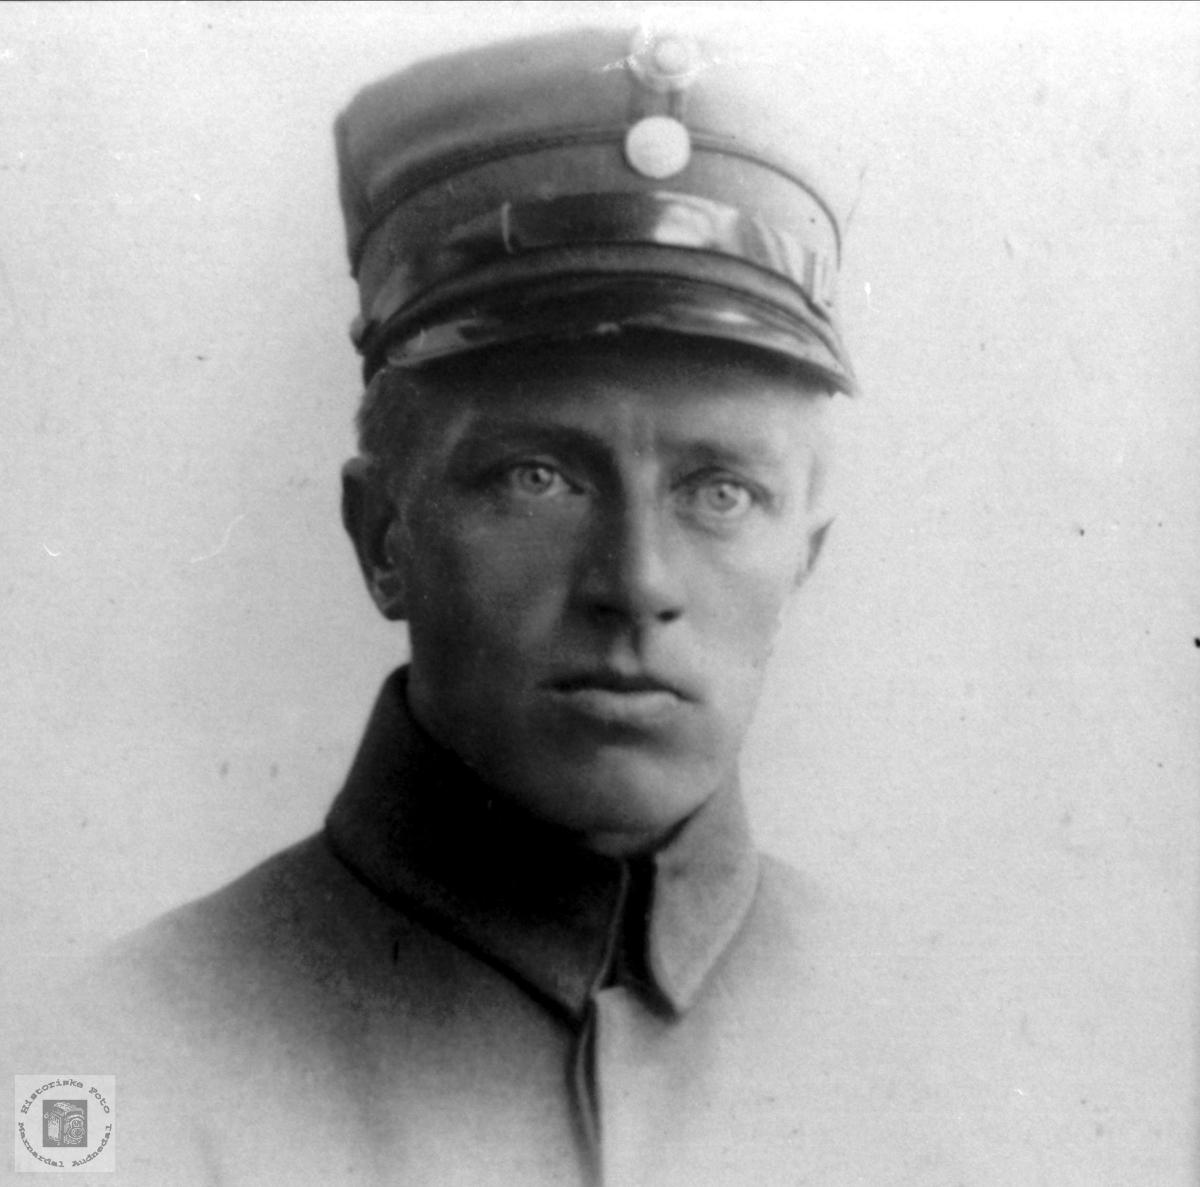 Portrett av Torkel Laudal, Laudal.